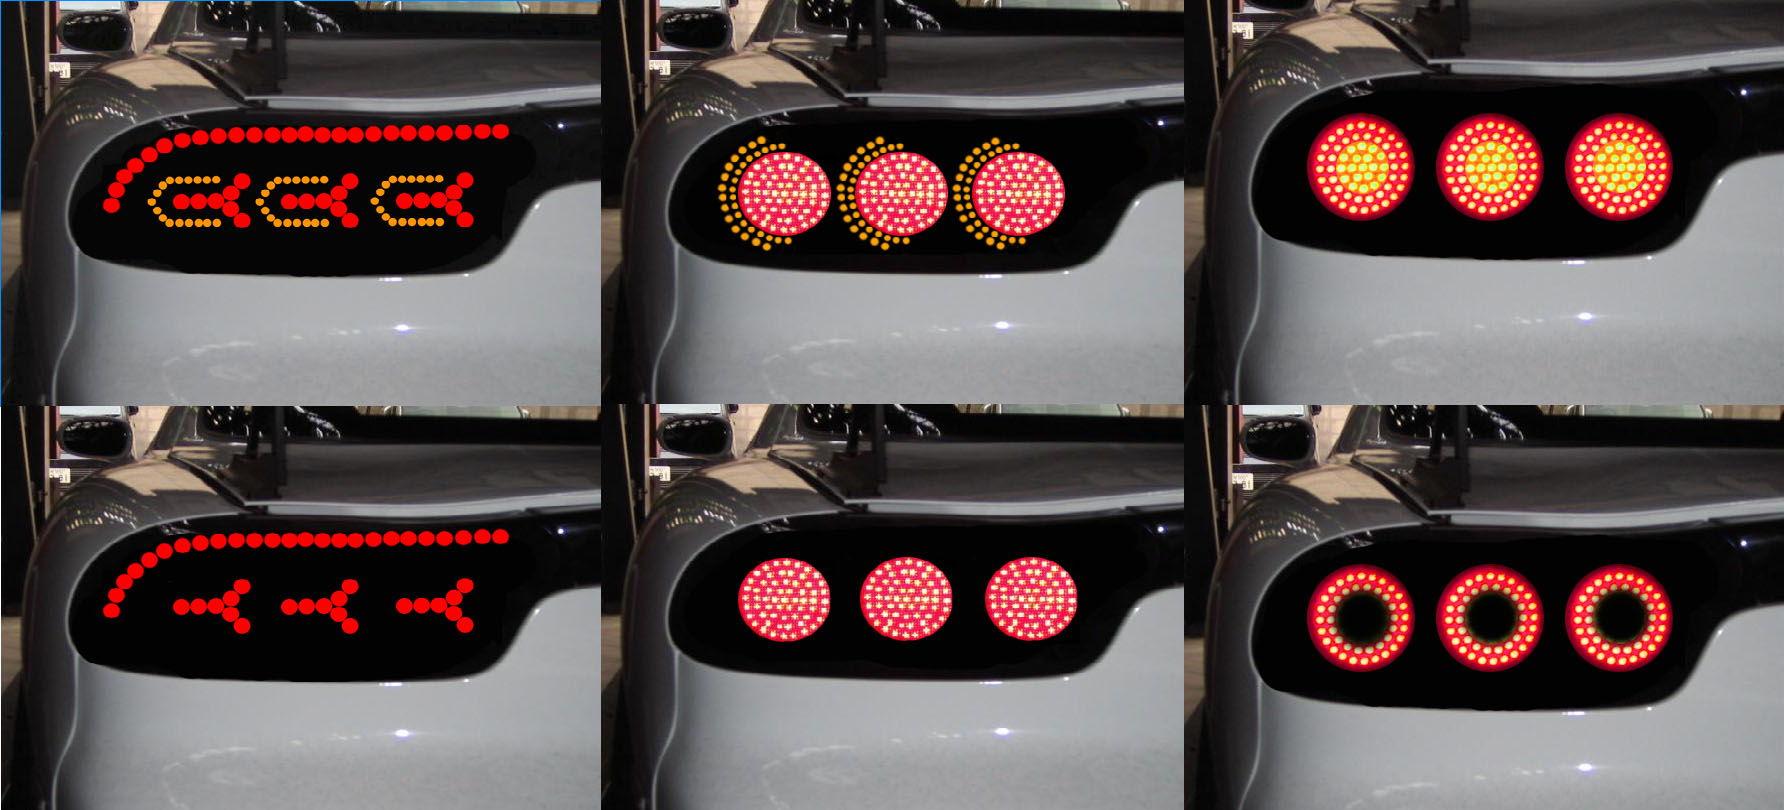 Making Custom Tail Lights Need Suggestions On Design